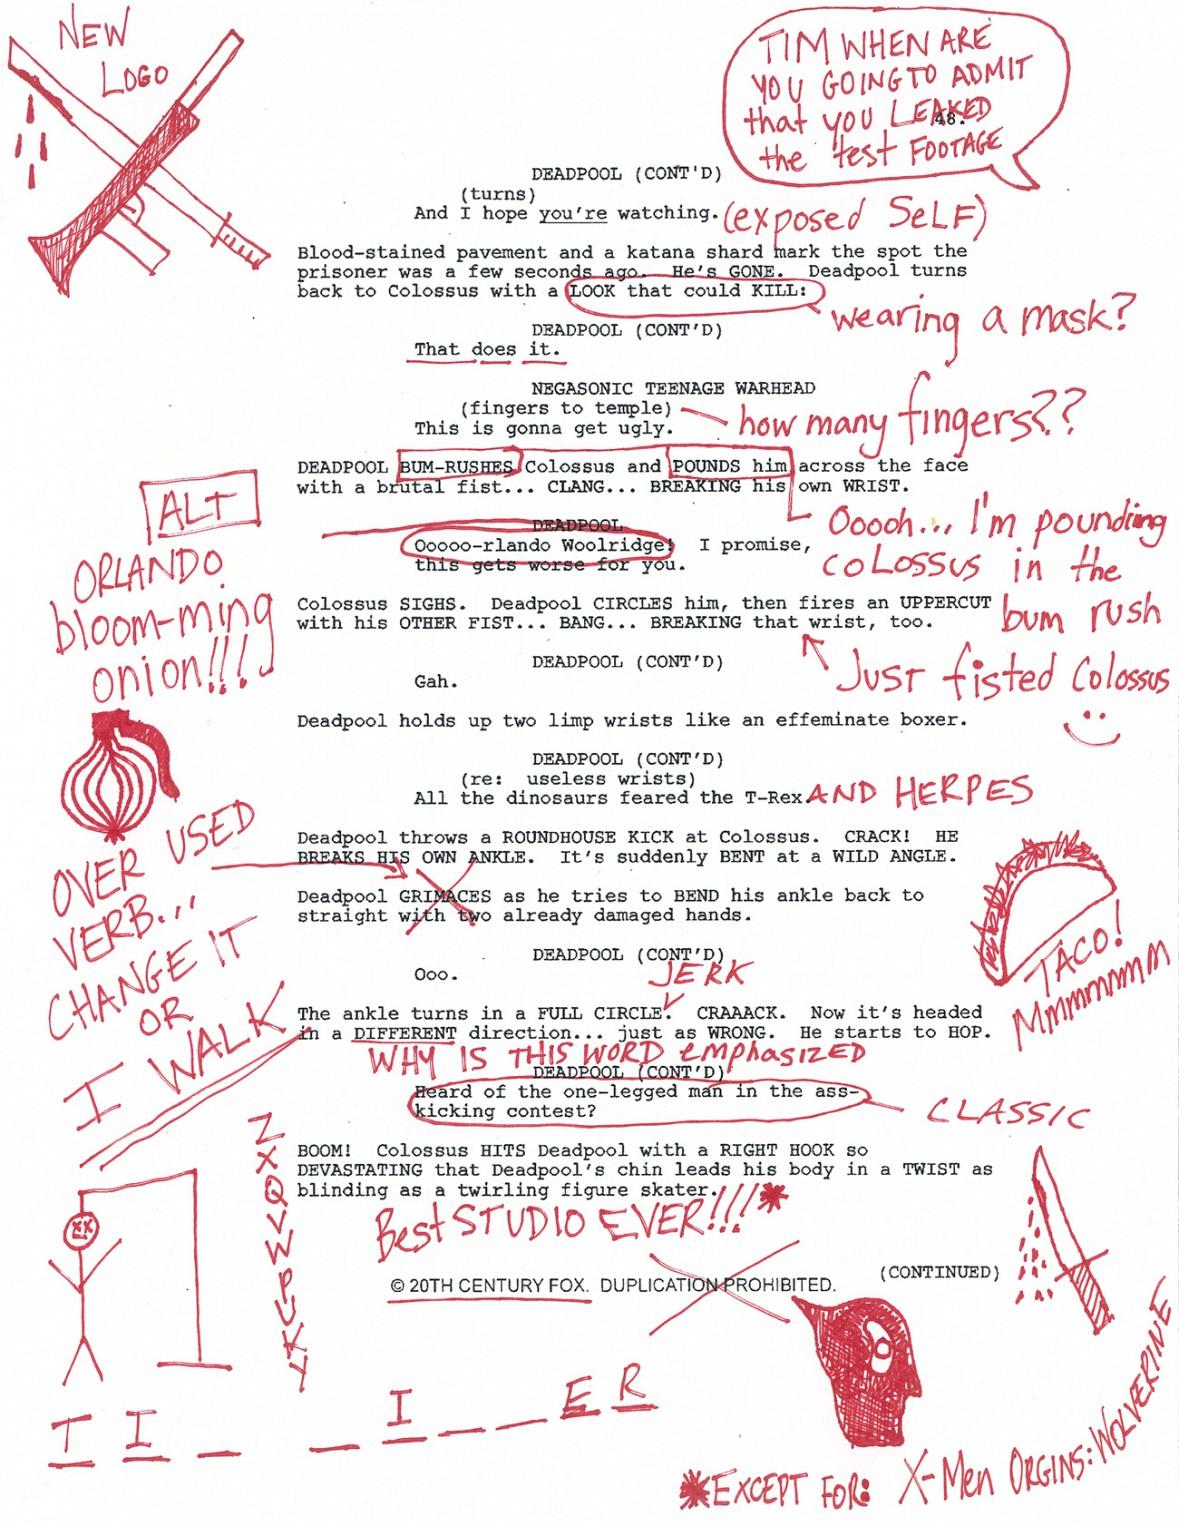 Deadpool script page